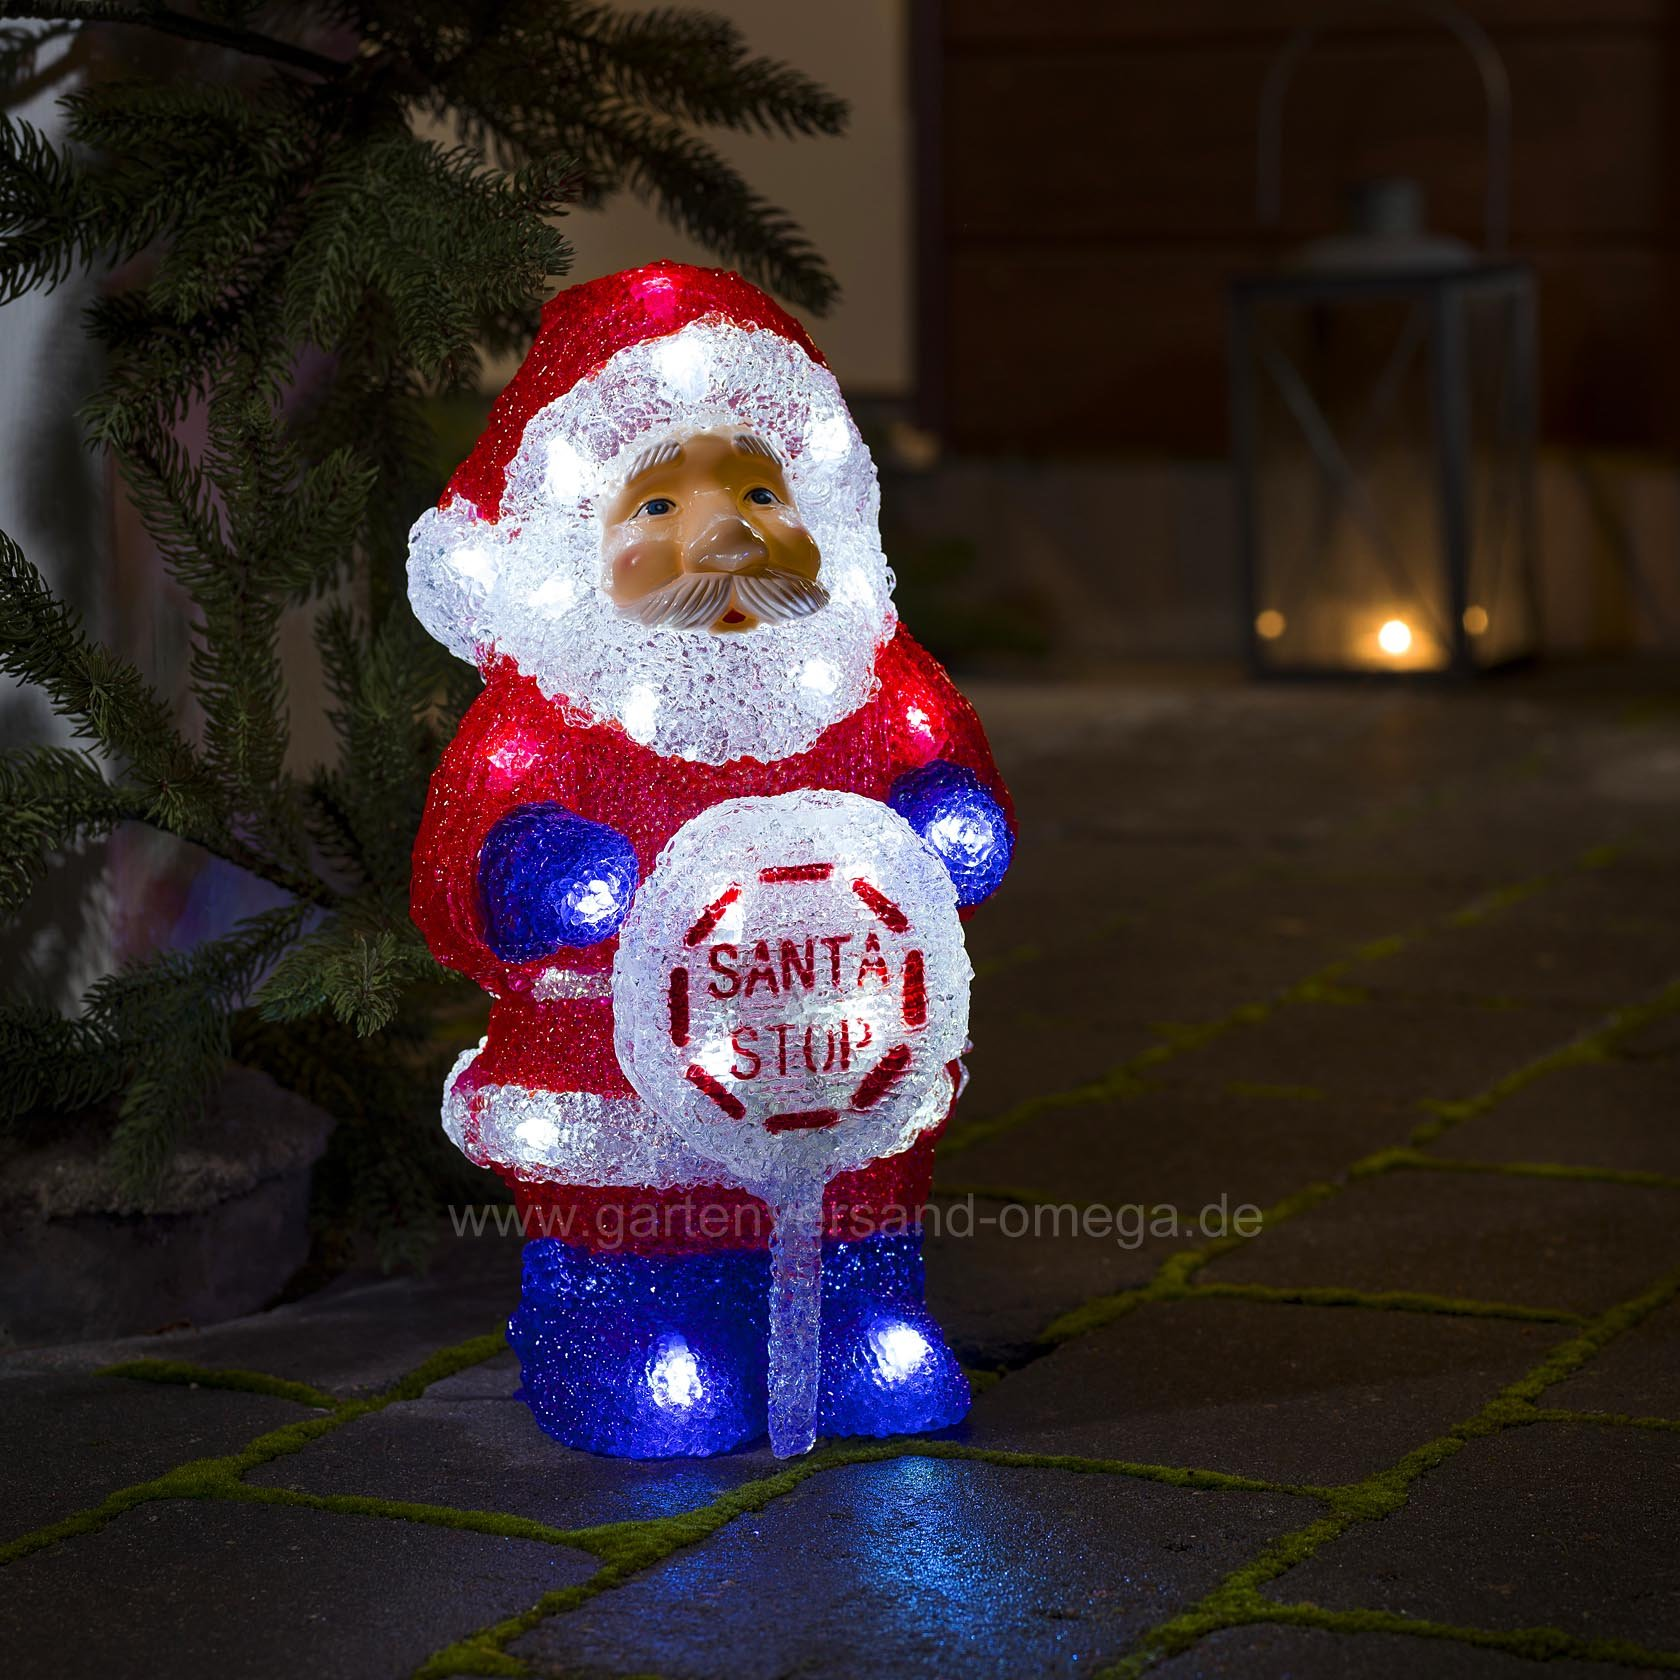 Weihnachtsbeleuchtung Figuren Led.Led Acrylfigur Weihnachtsmann Batteriebetrieben Batterie Led